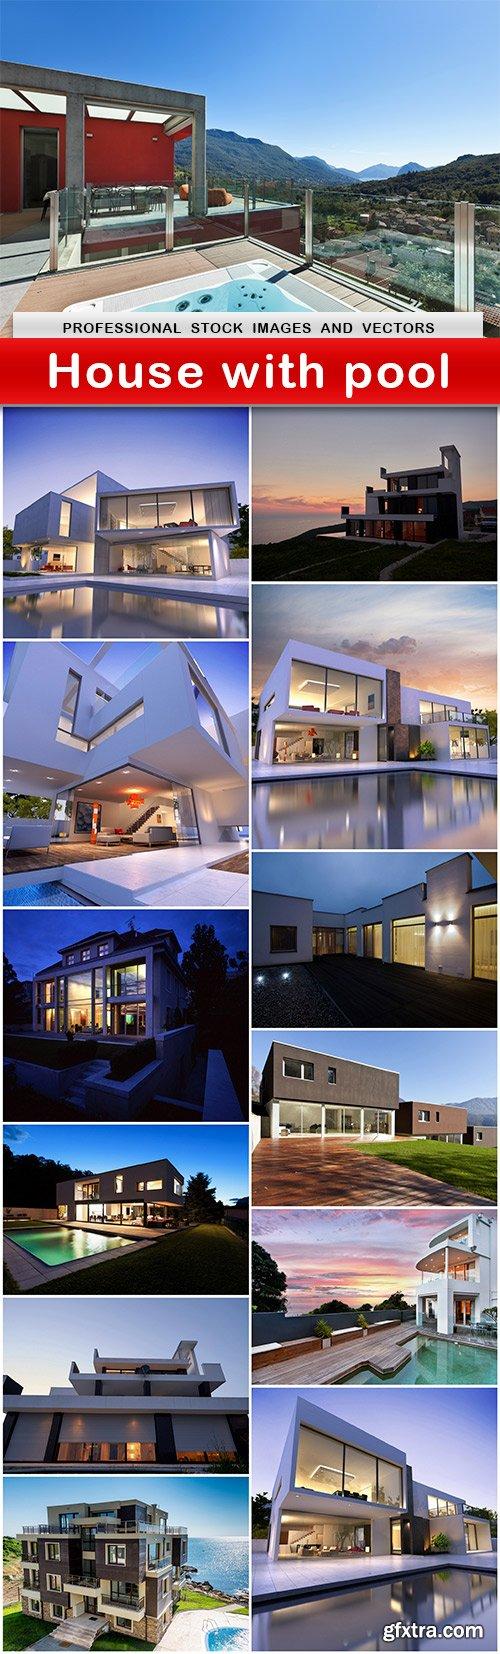 House with pool - 13 UHQ JPEG